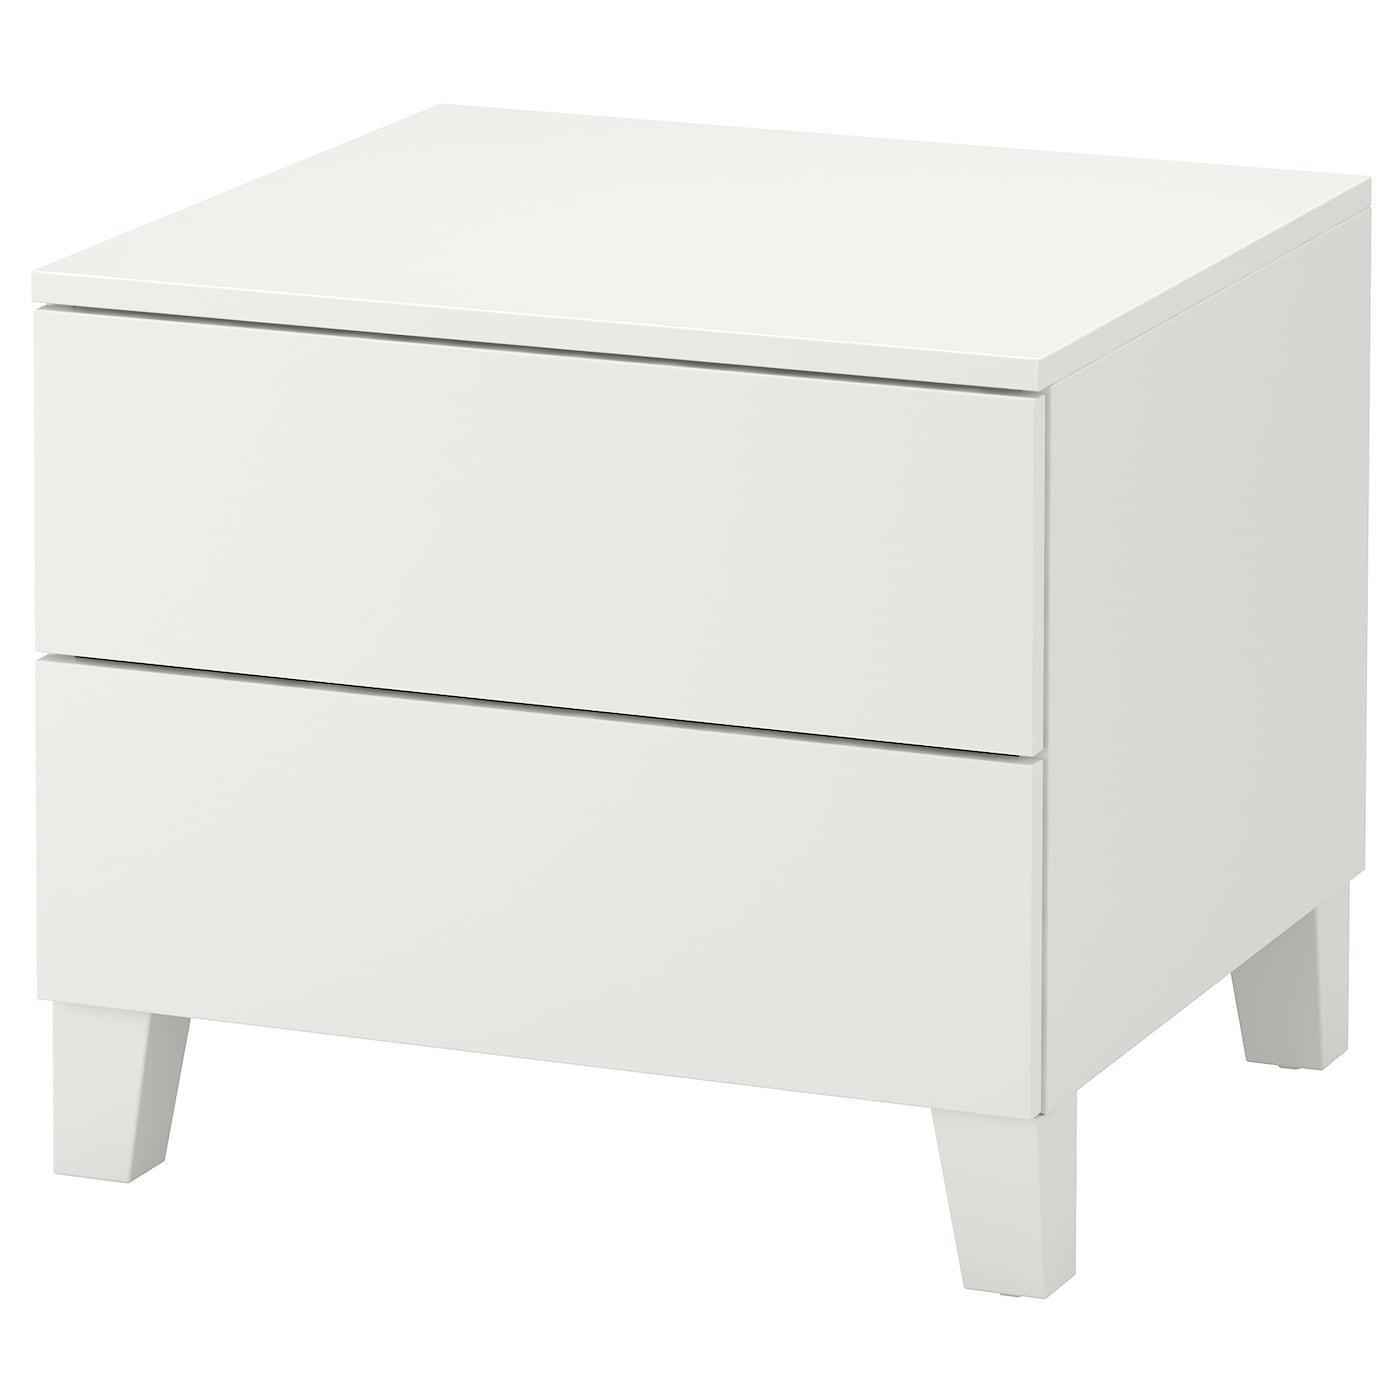 platsa commode 2 tiroirs blanc fonnes blanc 60 x 55 x 53 cm ikea. Black Bedroom Furniture Sets. Home Design Ideas